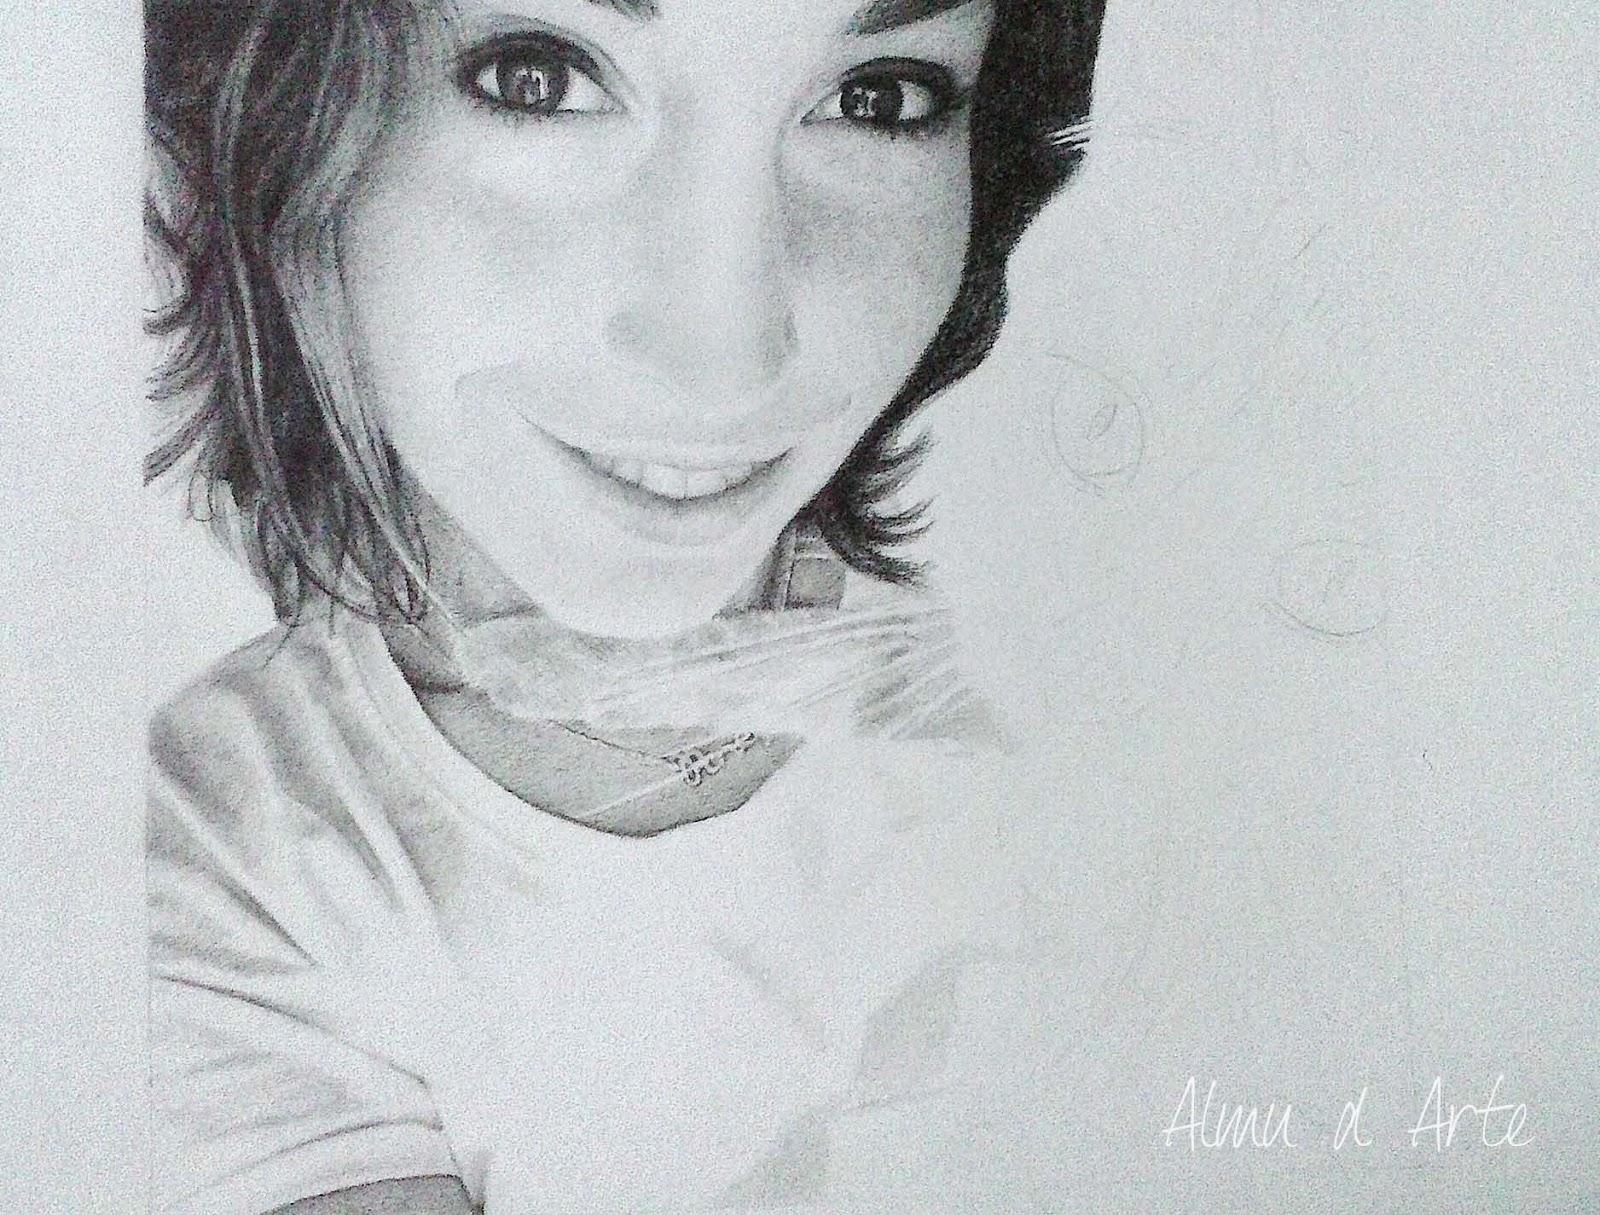 Dibujo a lápiz de Alma Obregón